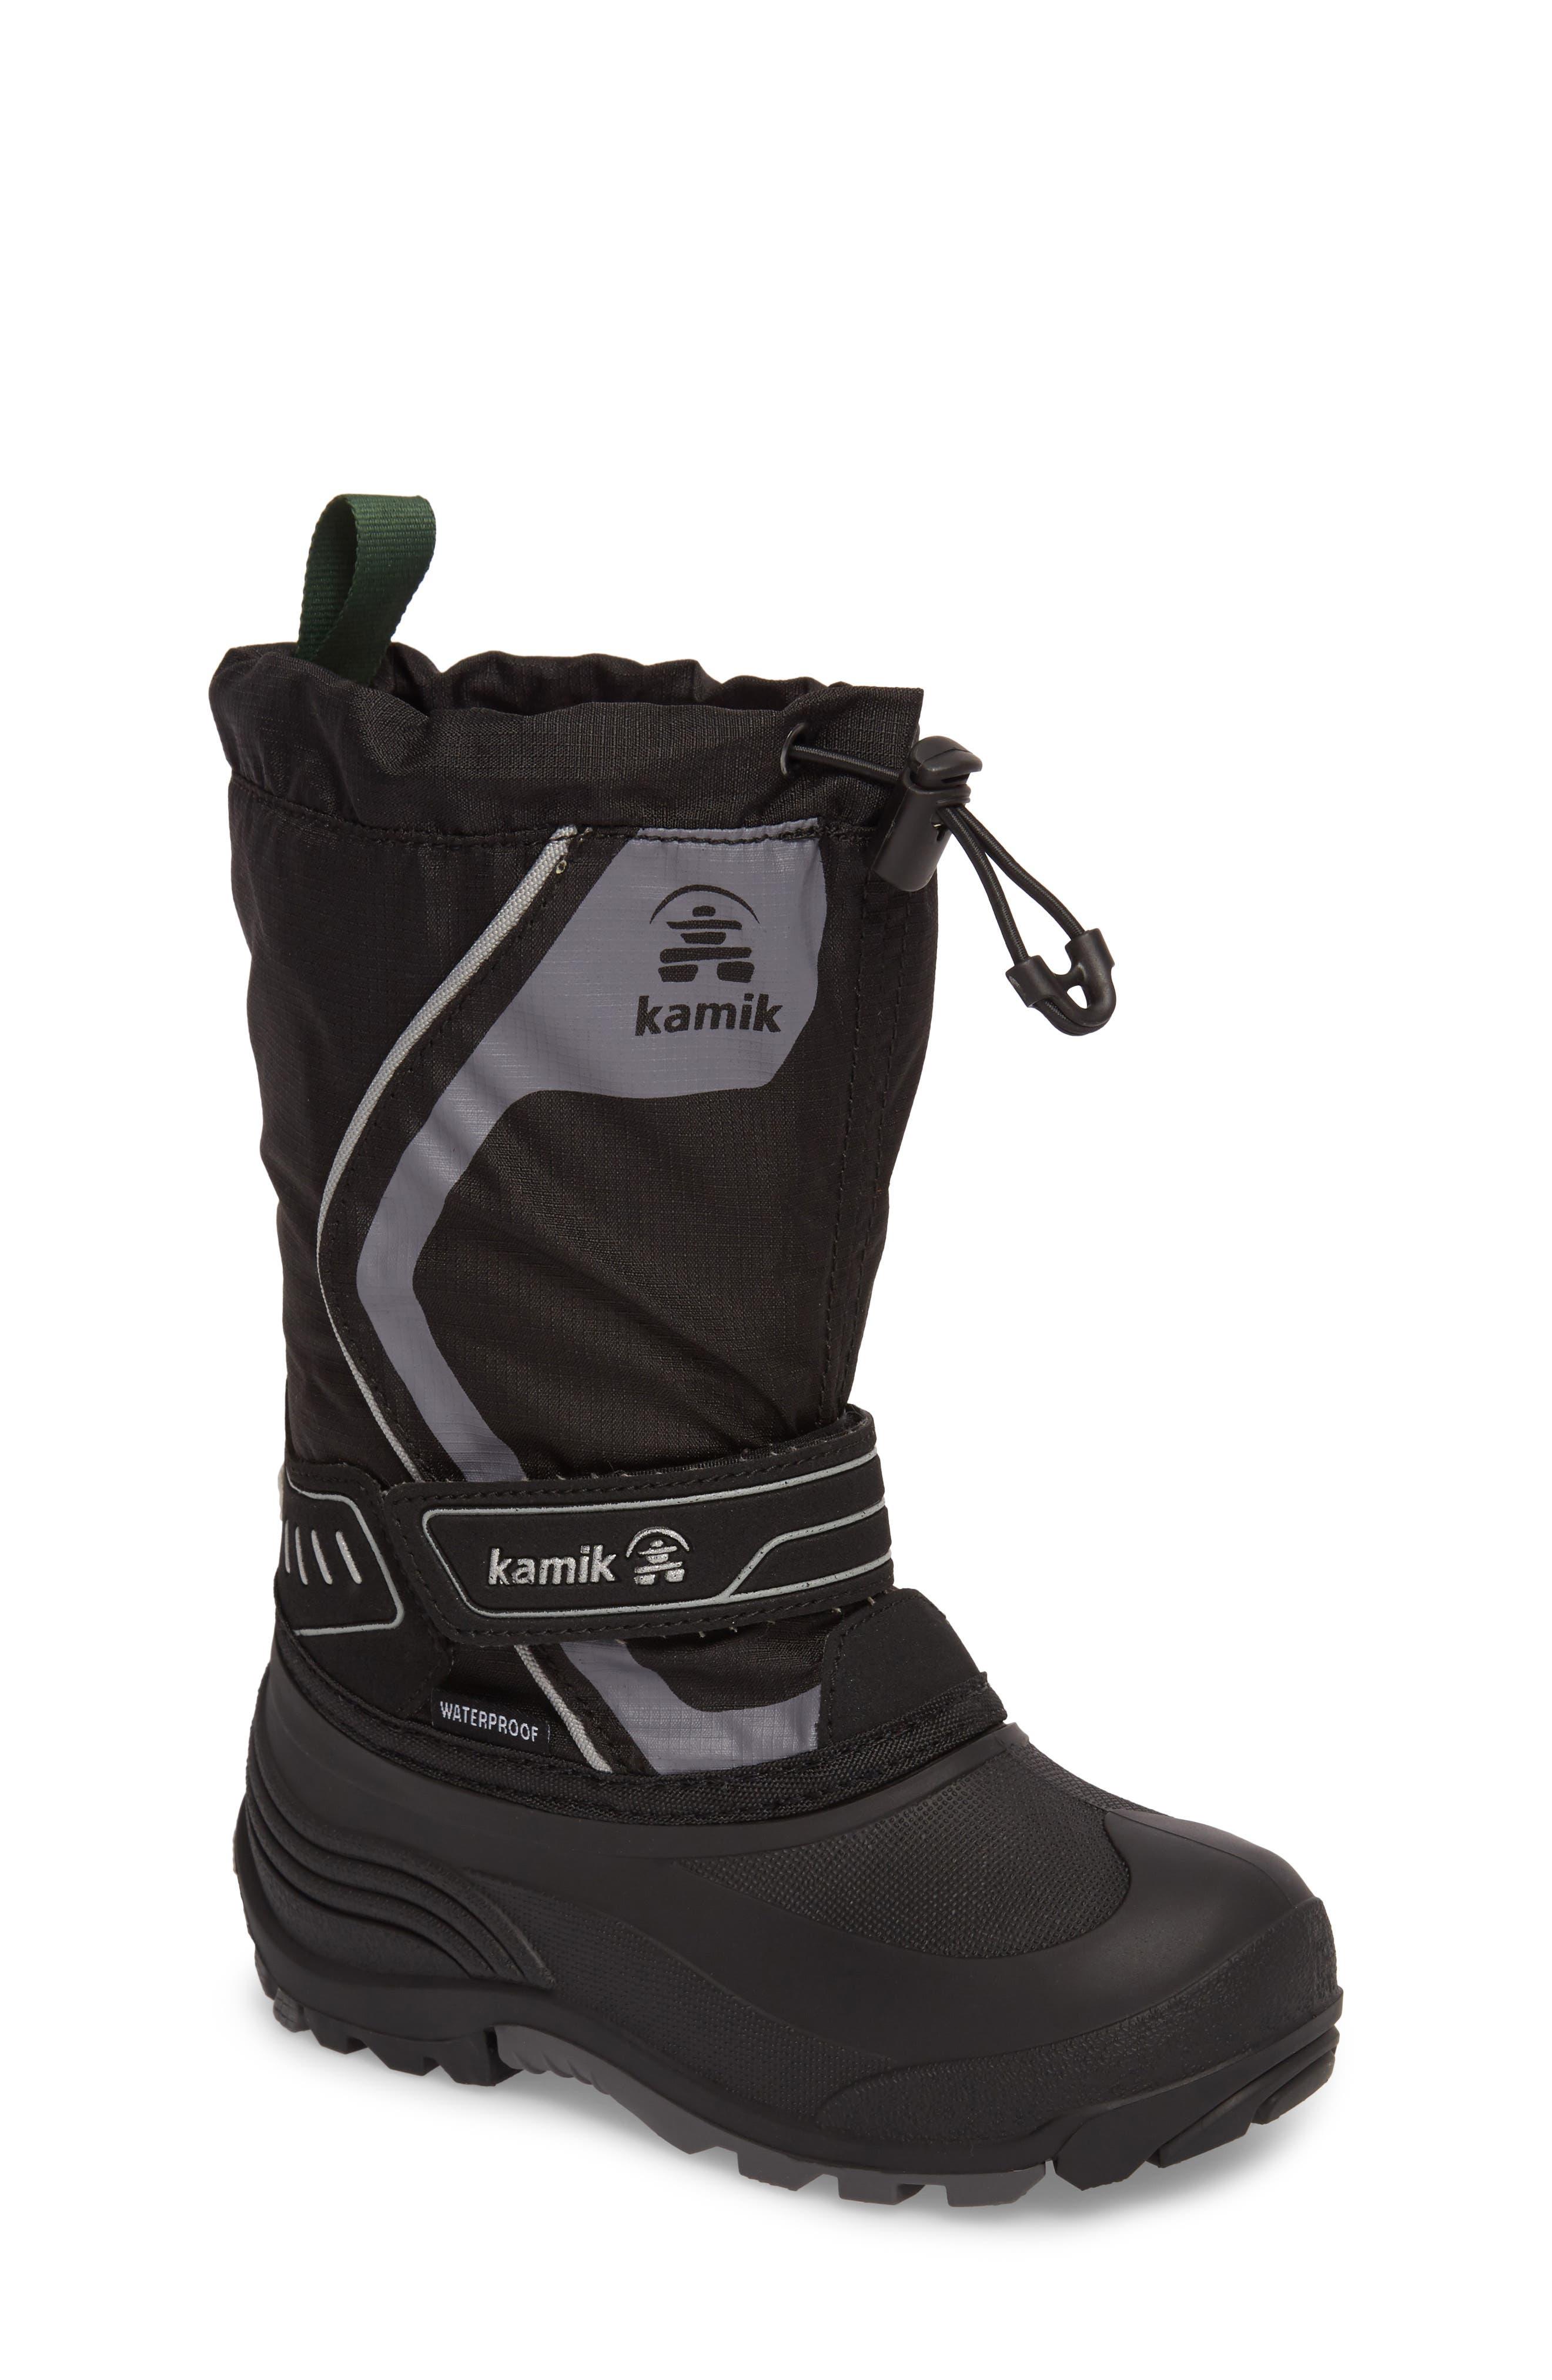 Main Image - Kamik Snowcoast3 Waterproof Snow Boot (Toddler, Little Kid & Big Kid)